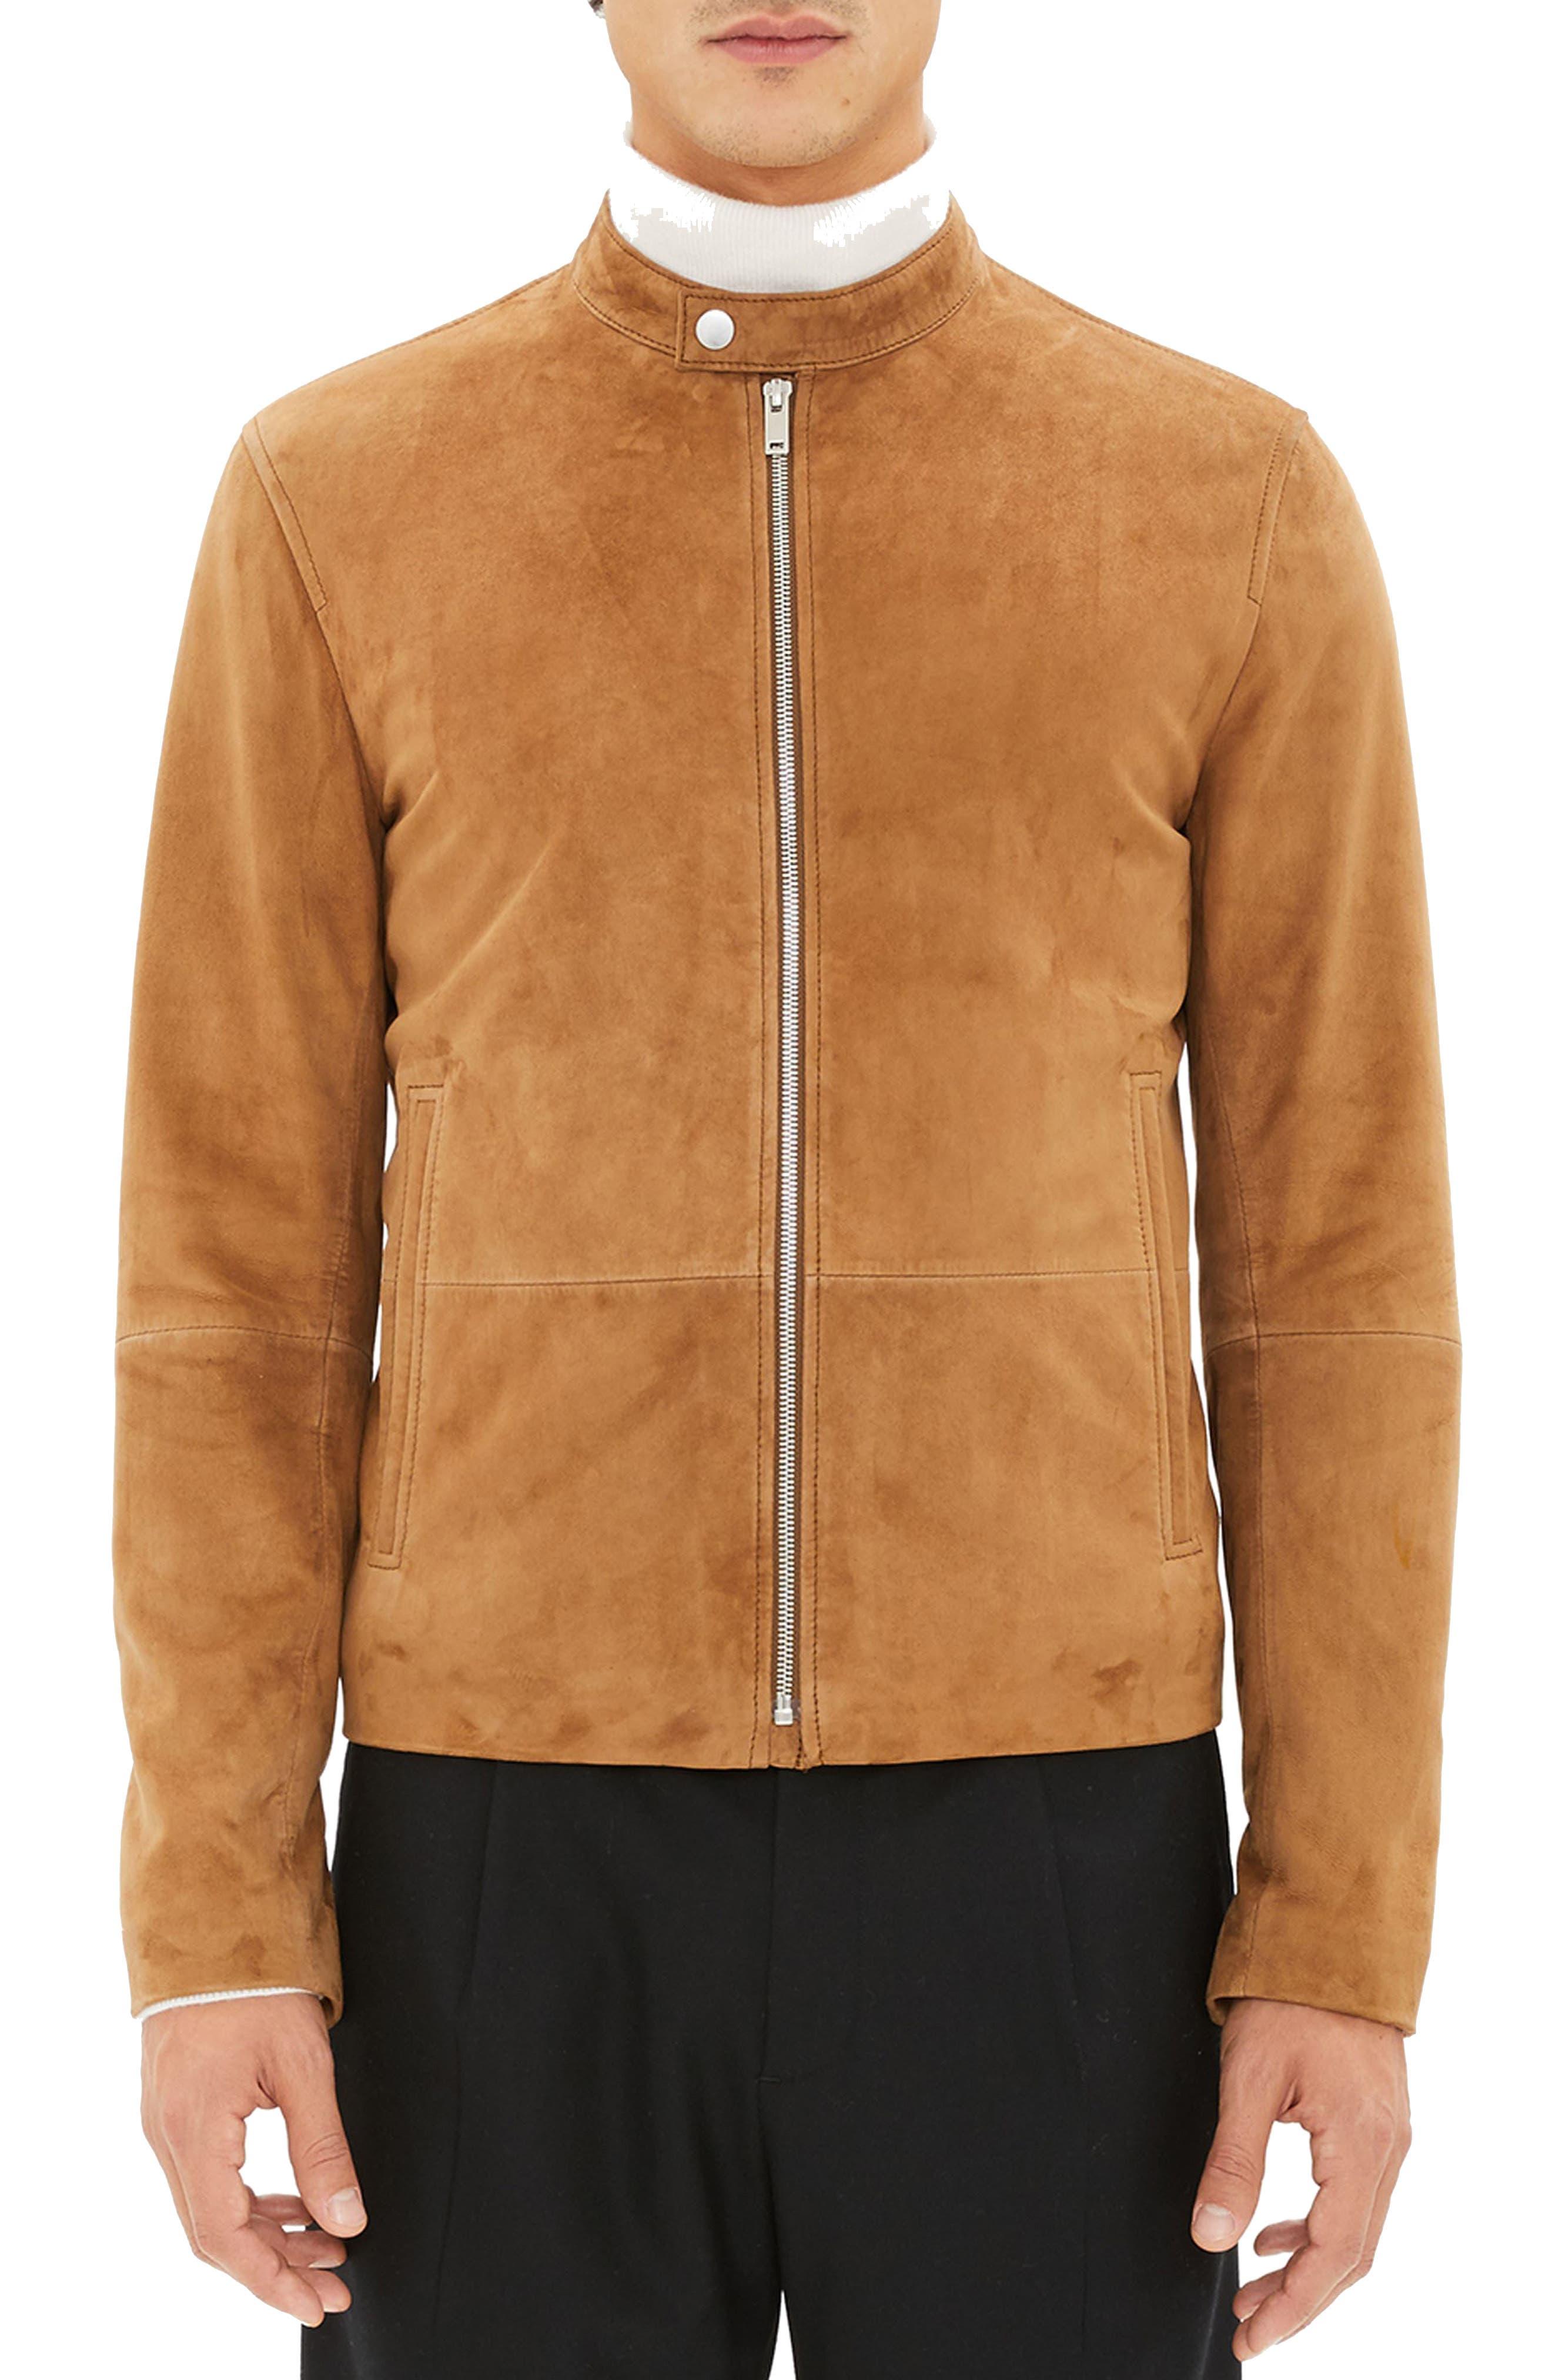 Wynwood Radic Leather Jacket,                             Main thumbnail 1, color,                             SANDSTORM